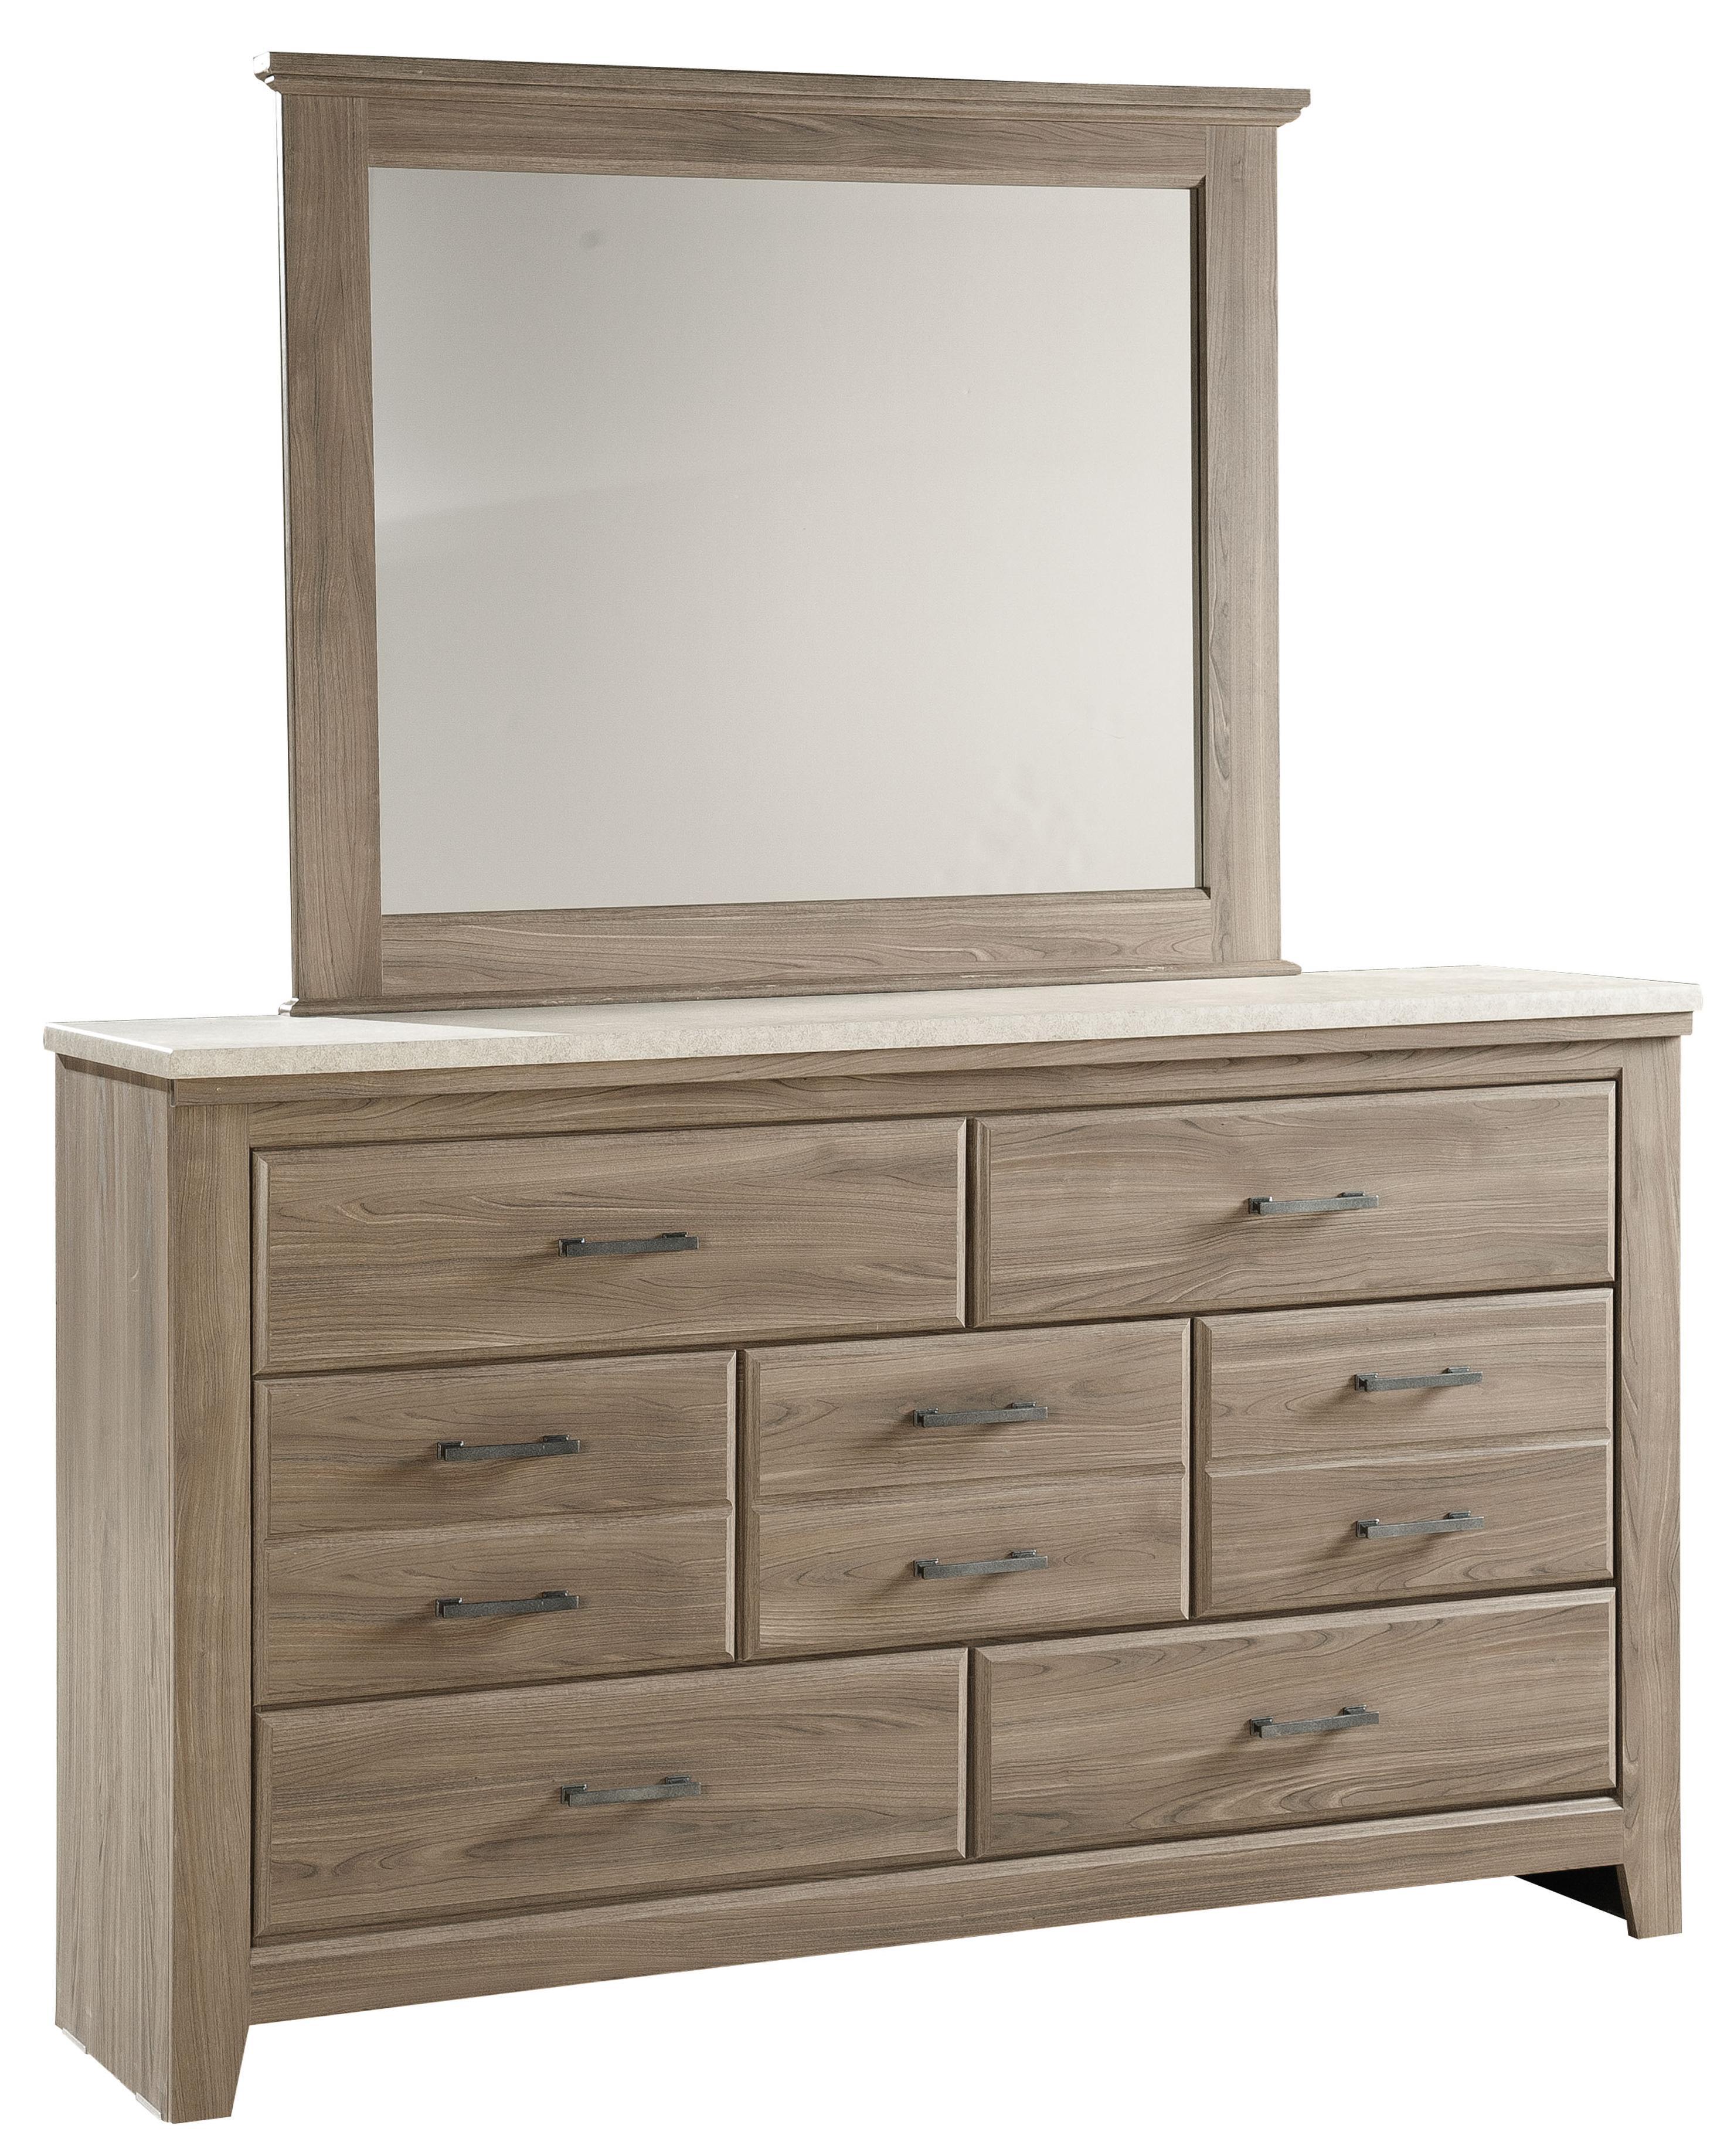 Standard Furniture Stonehill Dresser And Mirror   Item Number: 69409+18